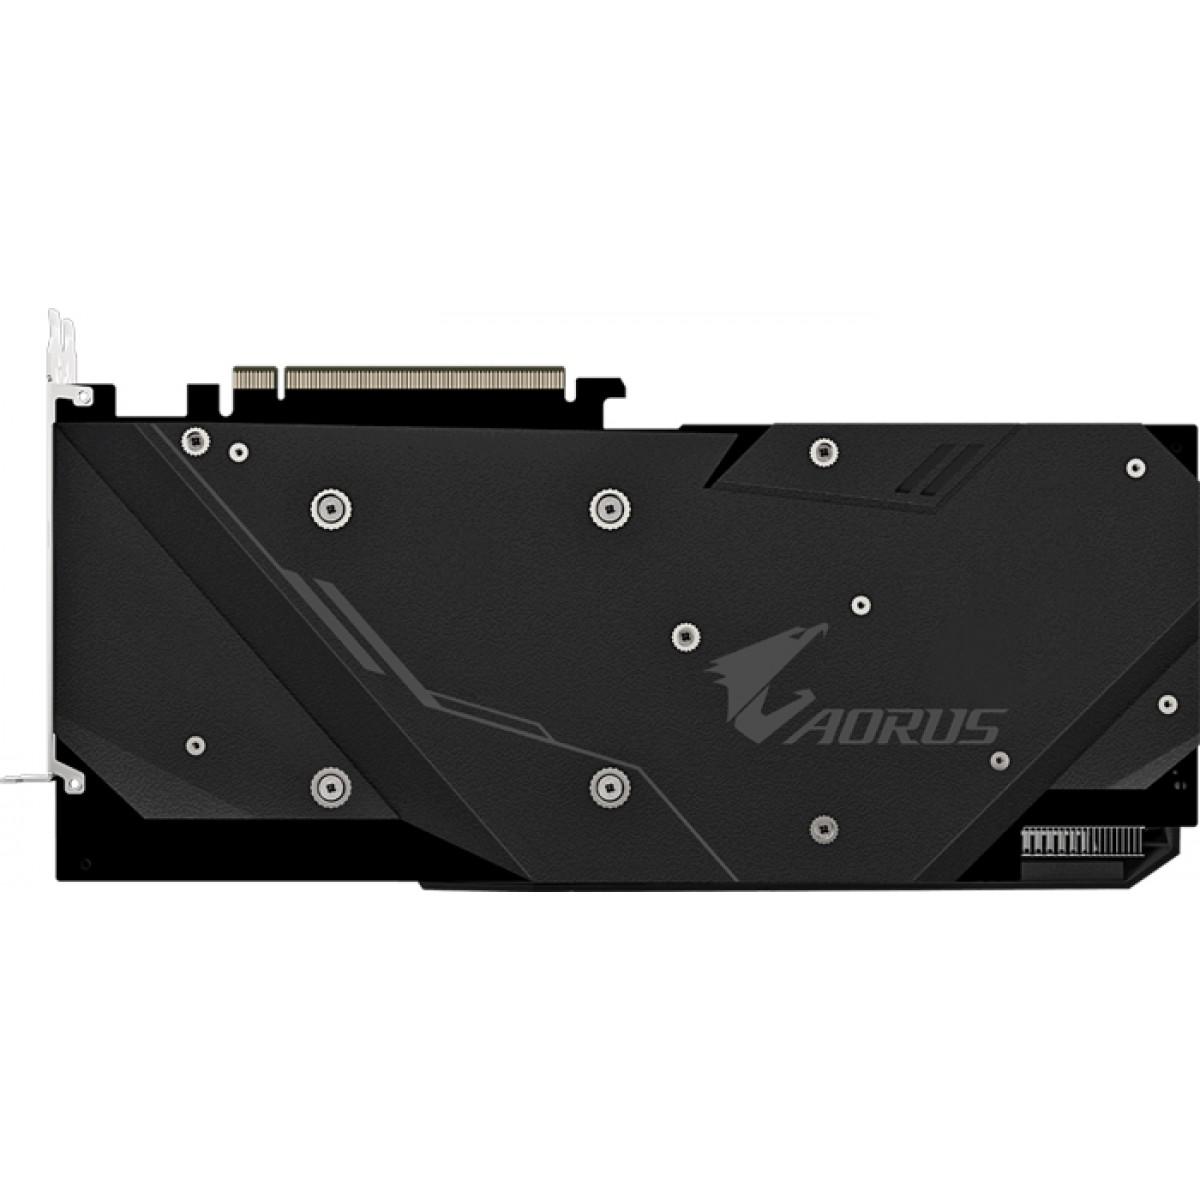 Placa de Vídeo Gigabyte GeForce RTX 2060 Super, 8GB GDDR6, 256Bit